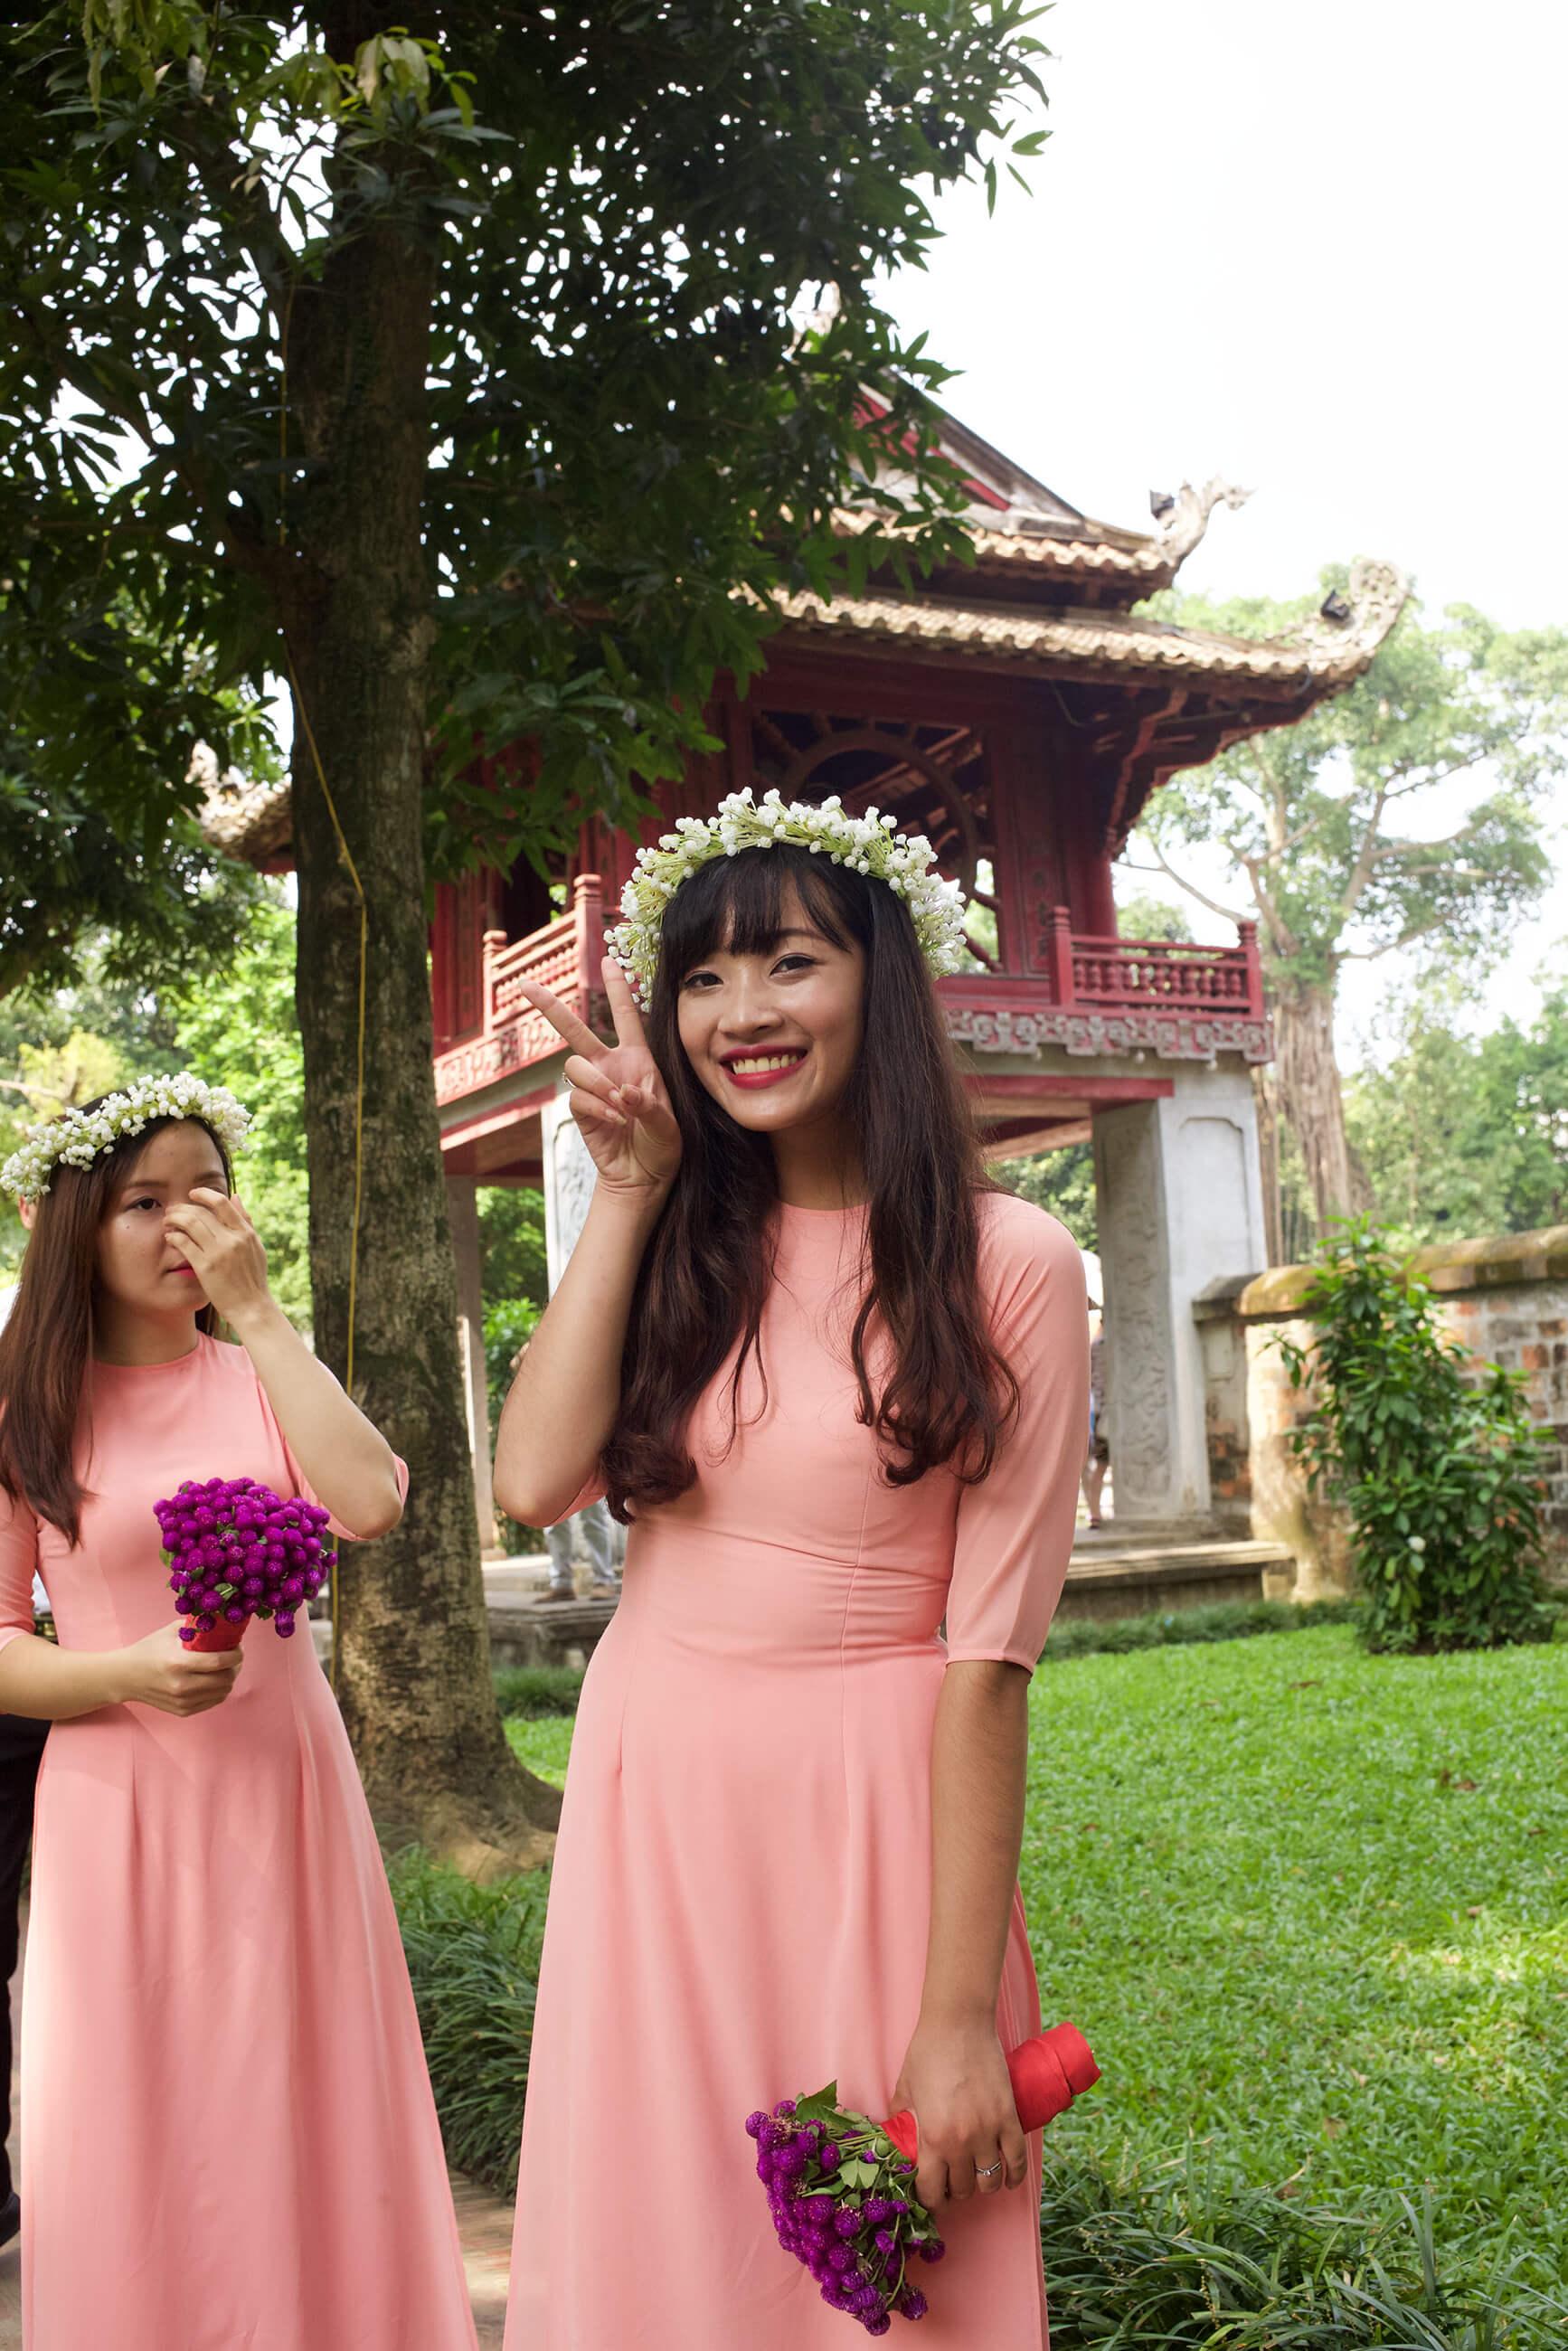 https://bubo.sk/uploads/galleries/4915/lubosfellner_vietnam_hanoj_chramliteratury_l1004508.jpg